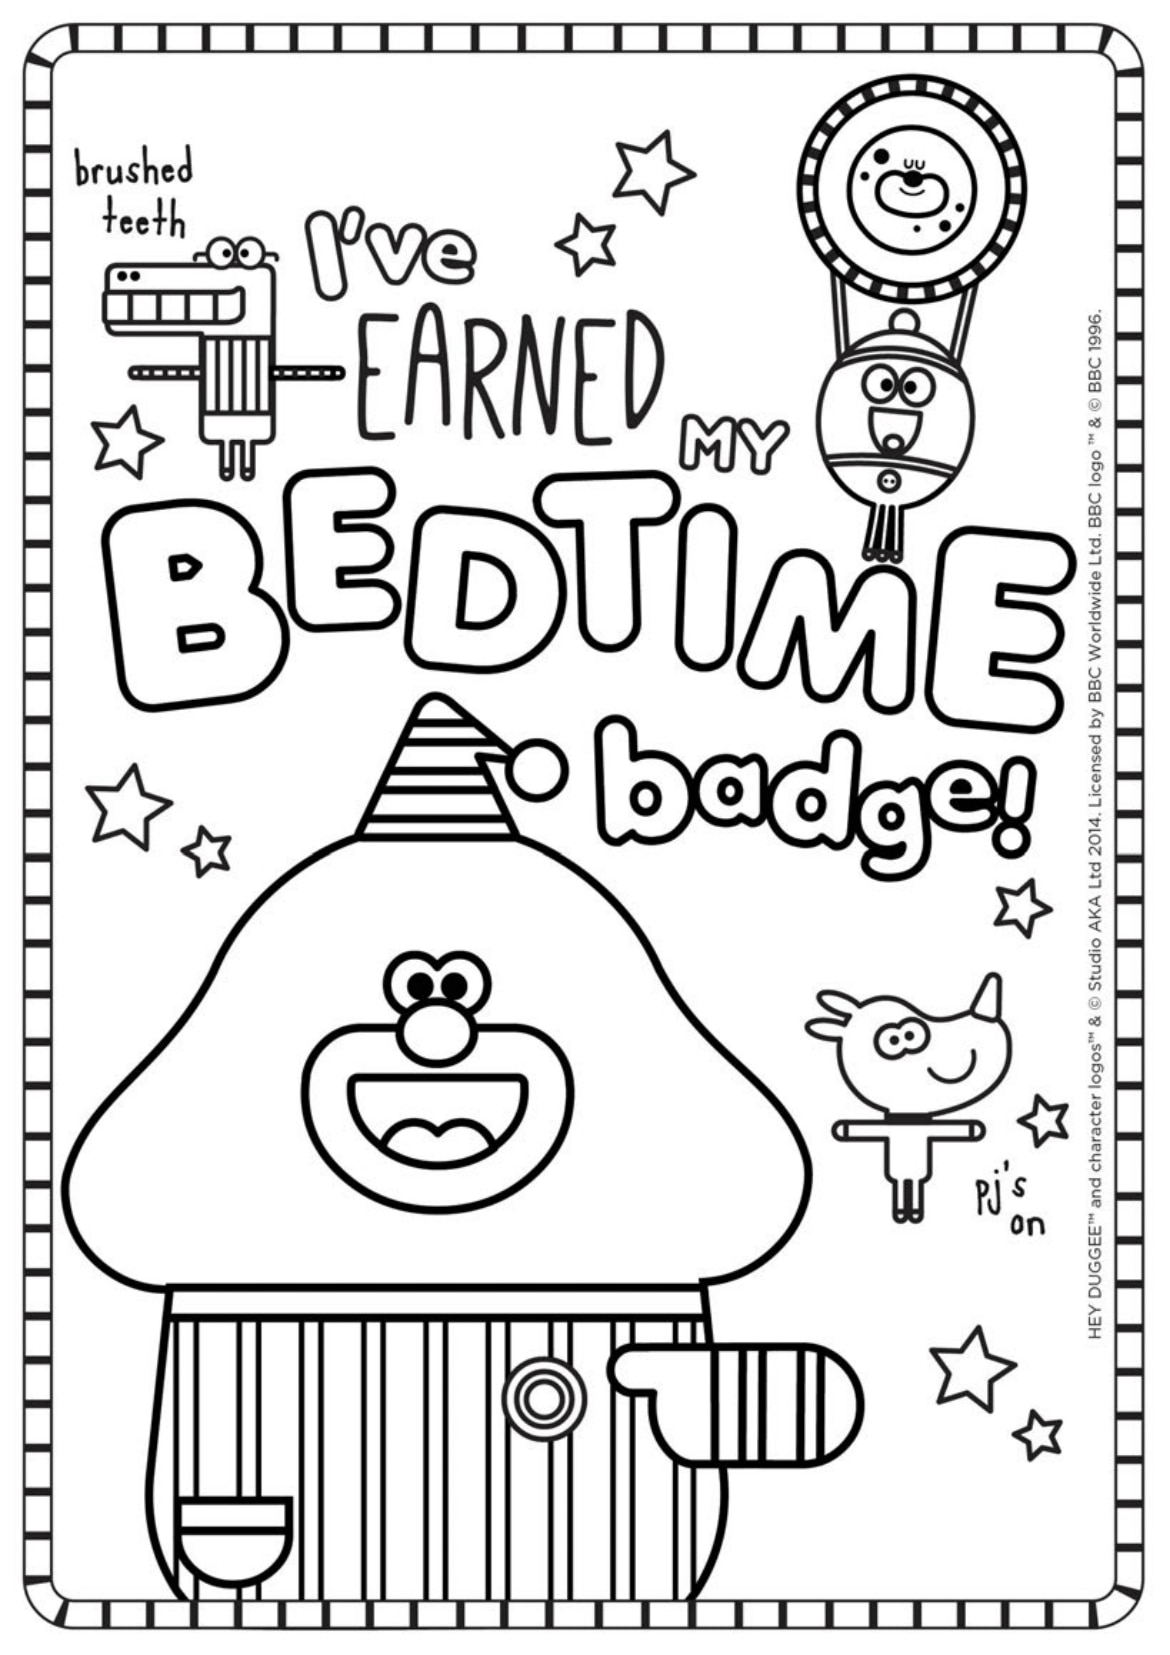 Bedtime Badge Colouring Sheet